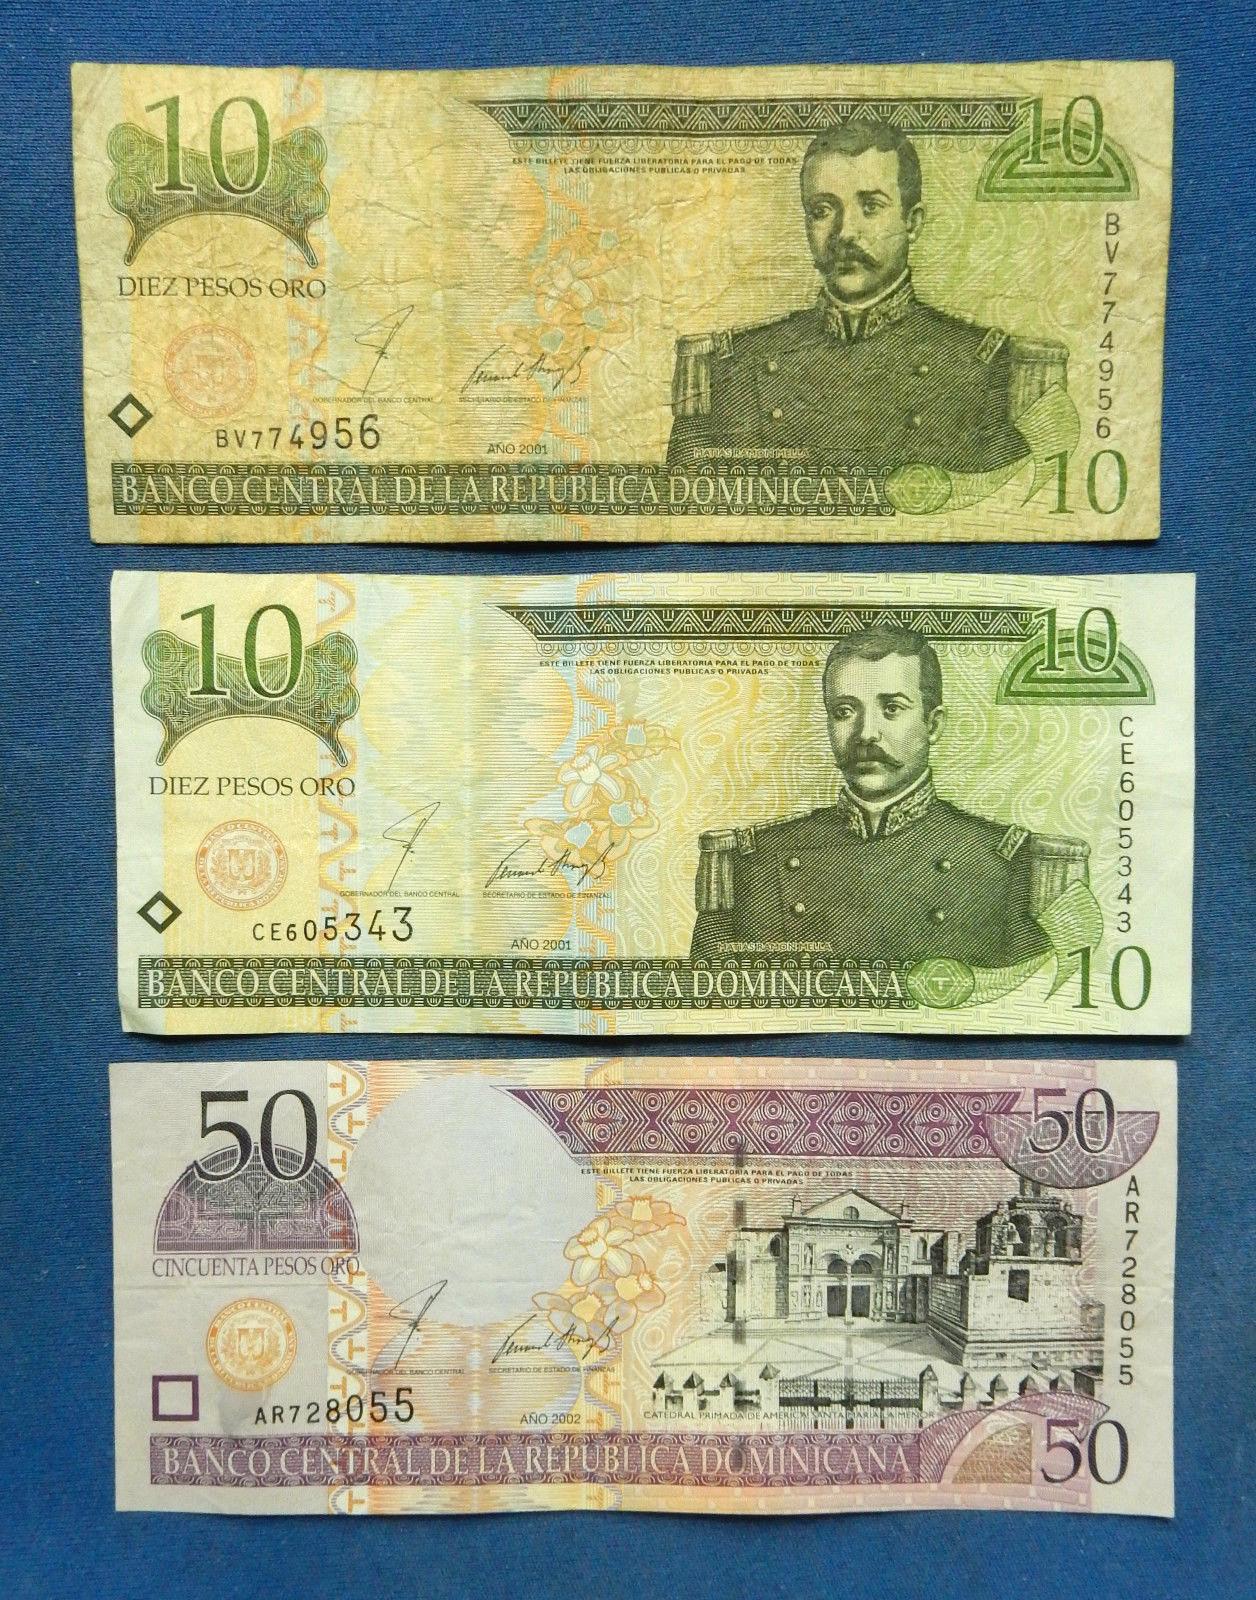 Dominican Republic Bank Notes - $59.00